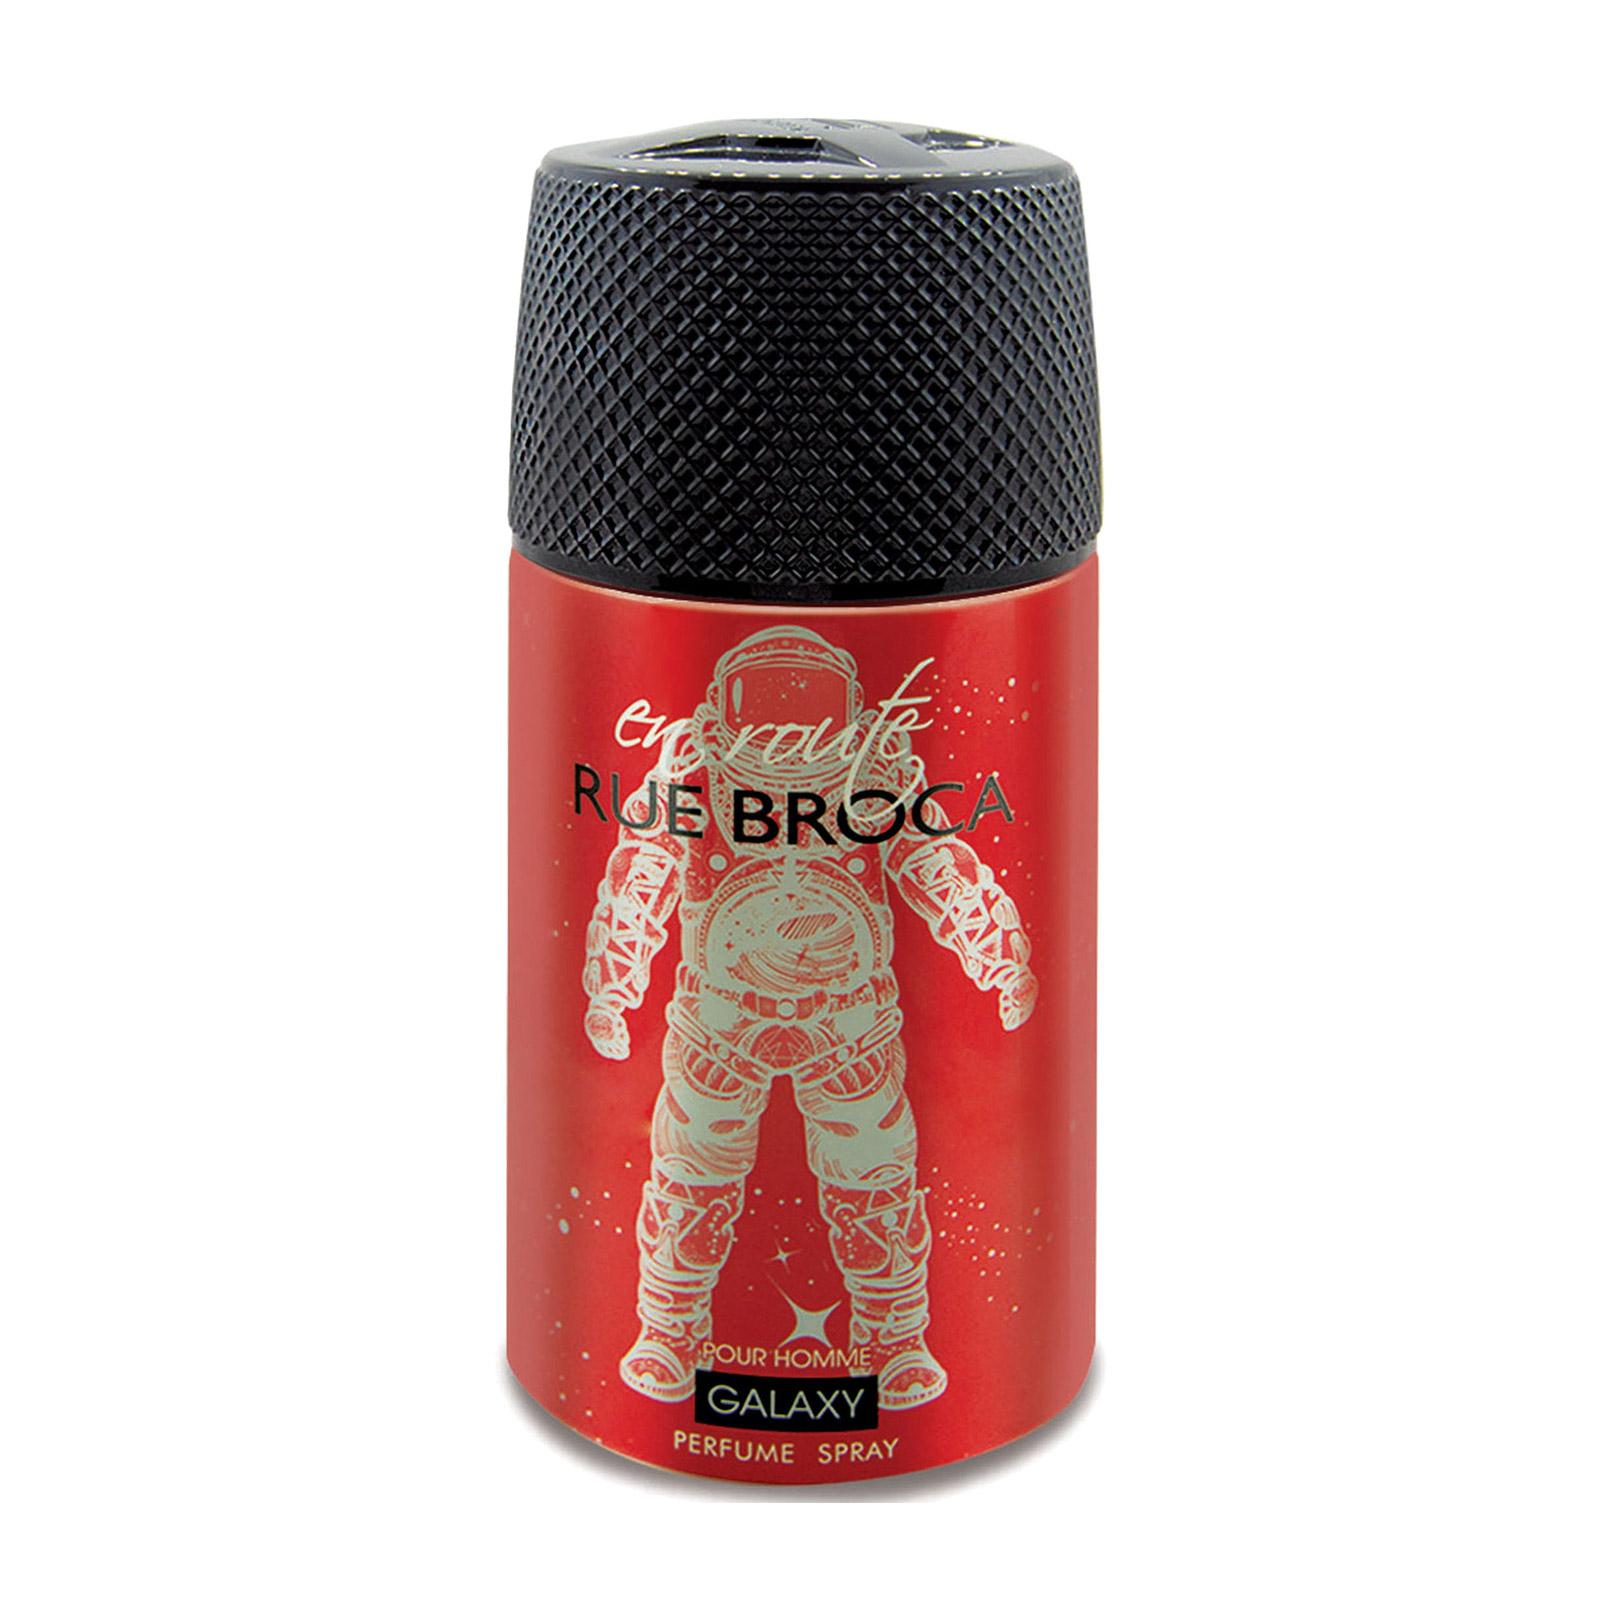 Дезодорант-спрей Rue Broca En Route Galaxy 250 мл недорого